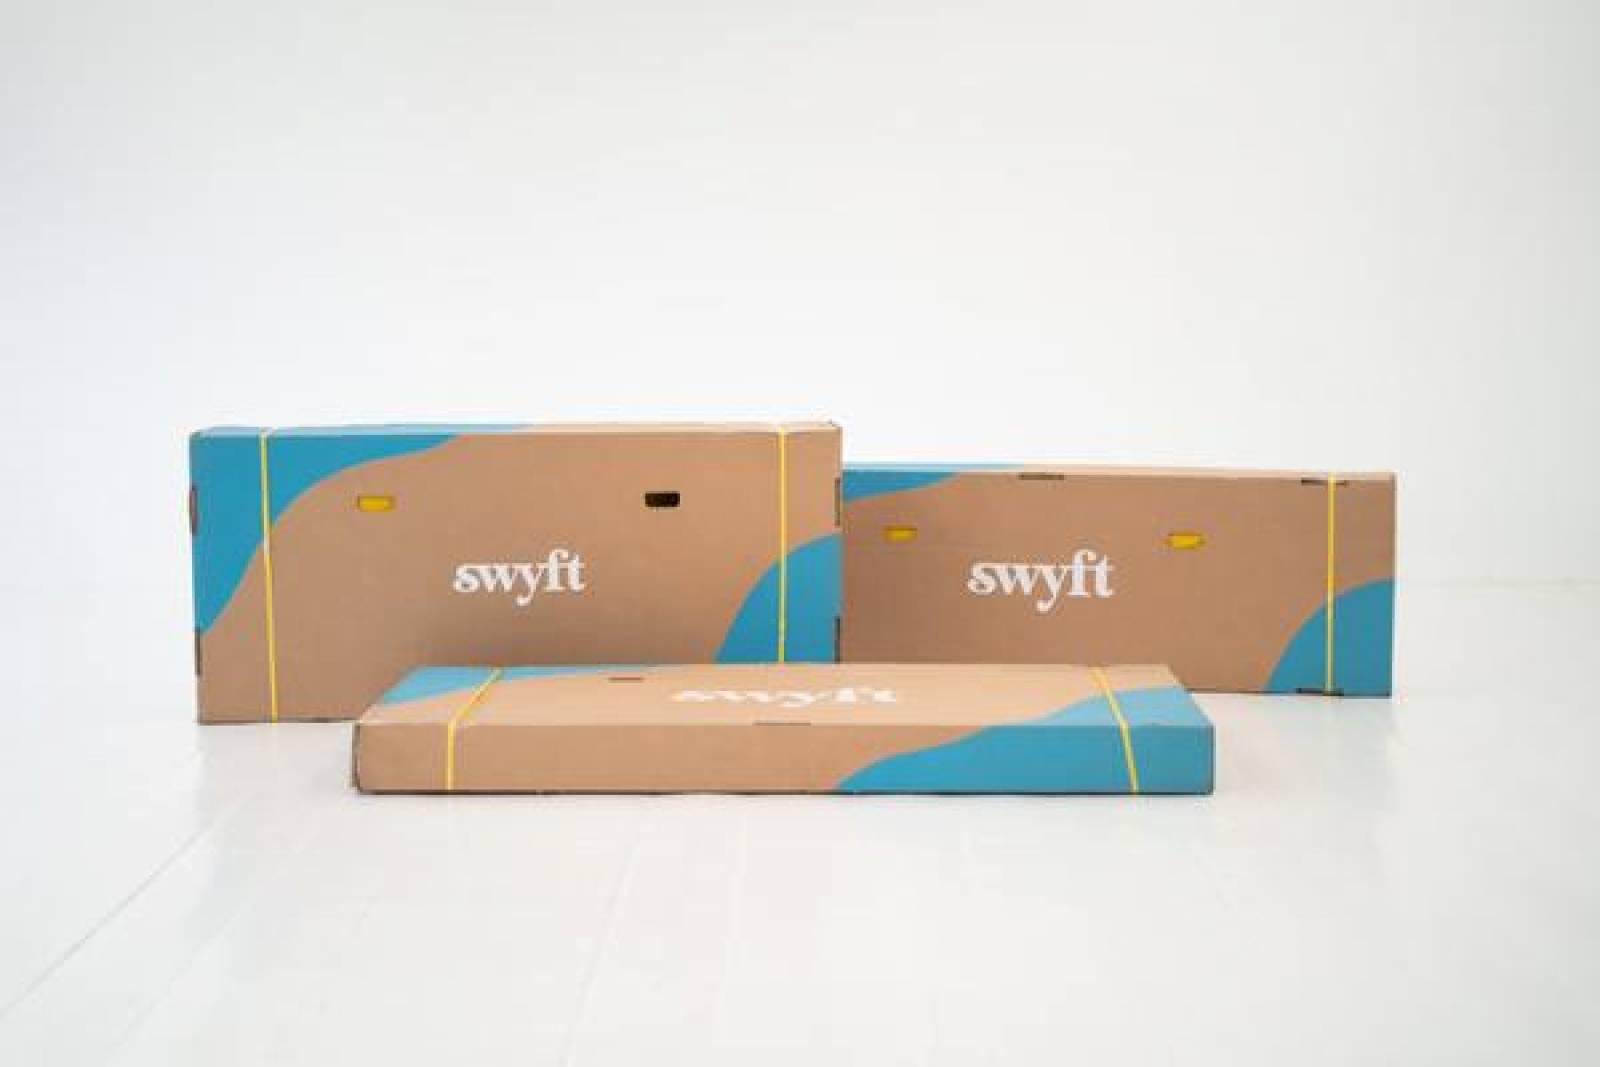 Swyft - Model 01 - 3 Seater Sofa - Linen Seaglass thumbnails